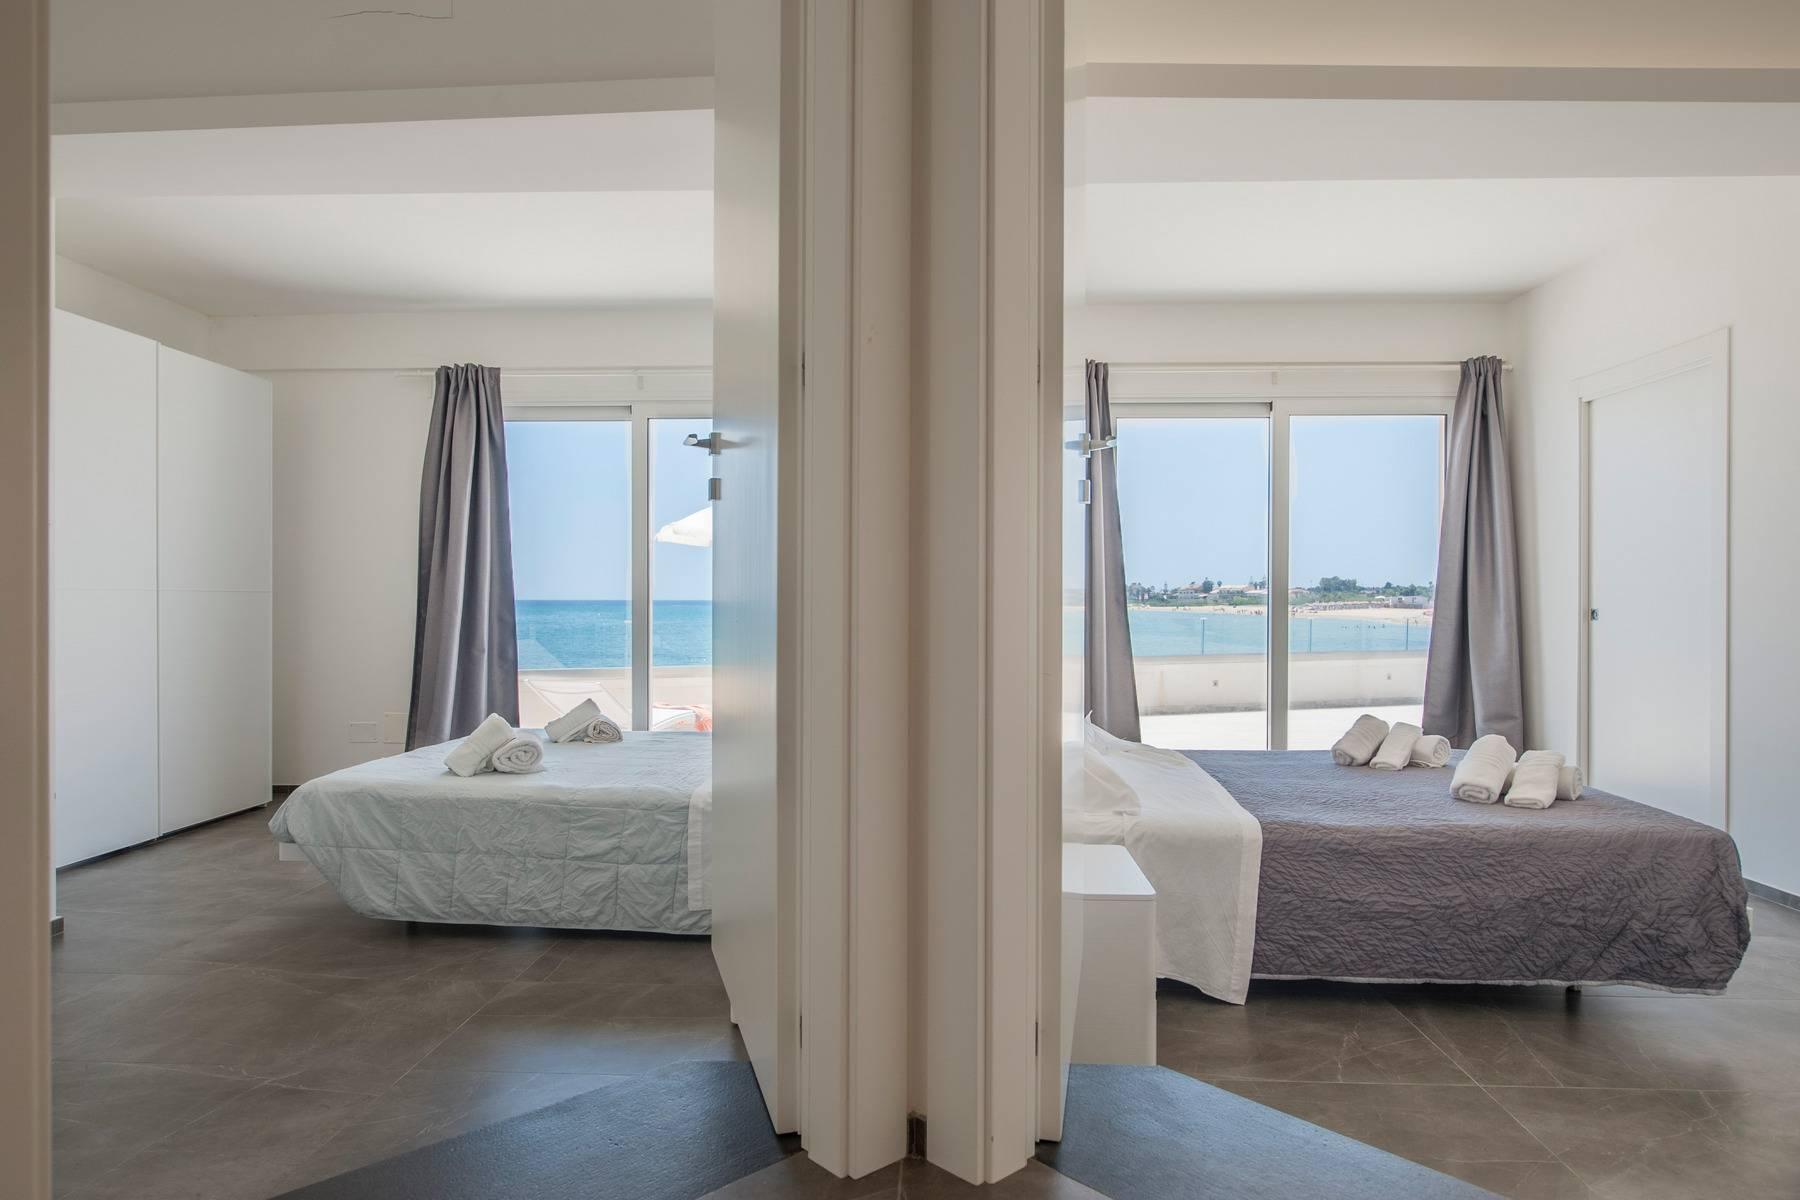 Exclusive villa with sea view in Avola - 8